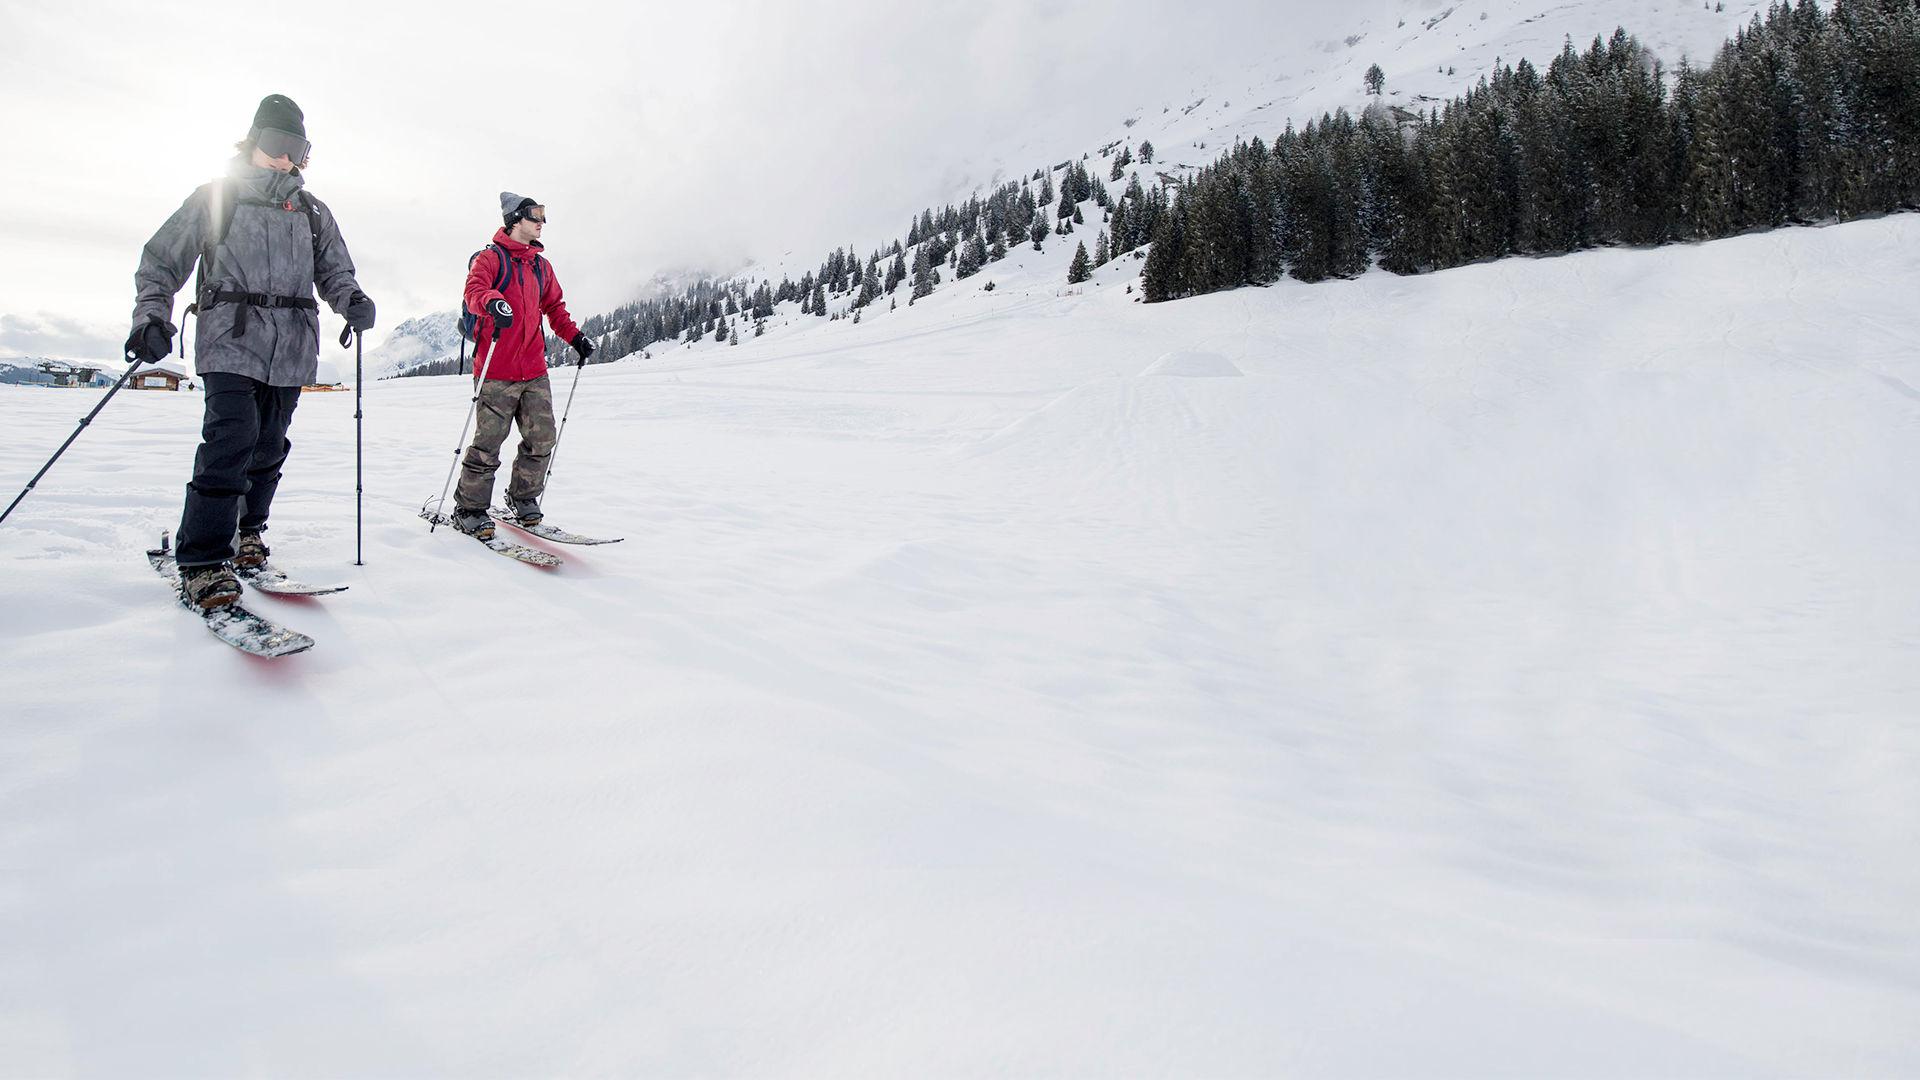 Two splitboarders taking a hike on the mountain